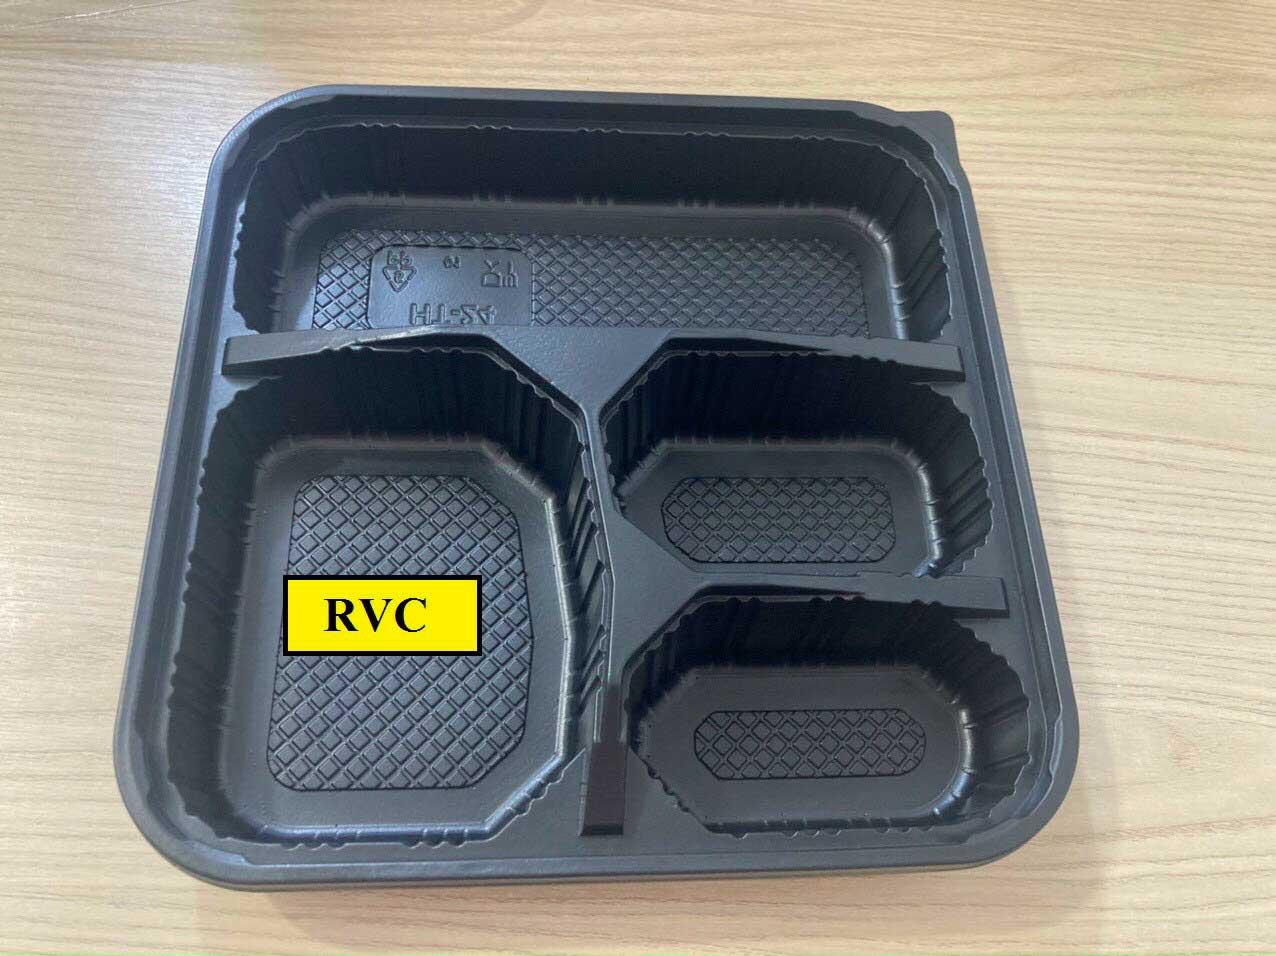 hộp cơm 4 ngăn